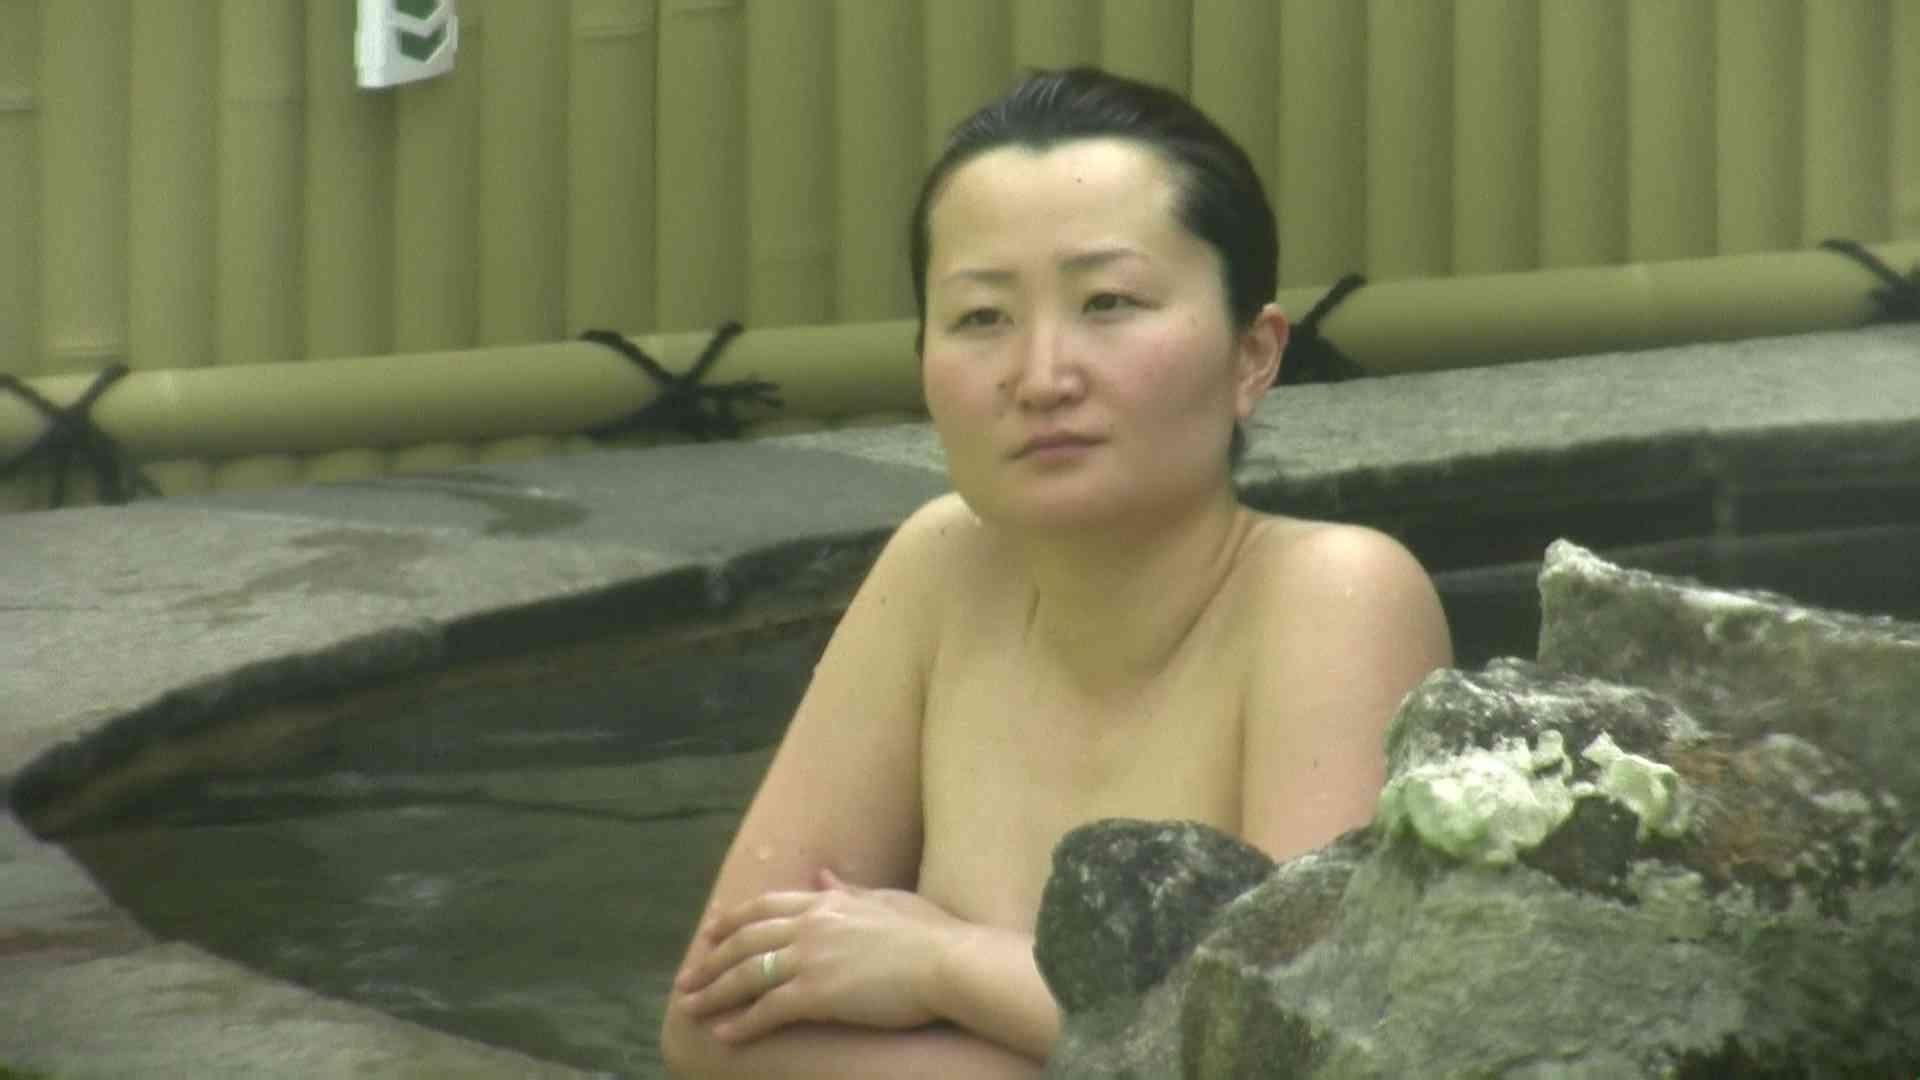 Aquaな露天風呂Vol.632 露天 戯れ無修正画像 70画像 44